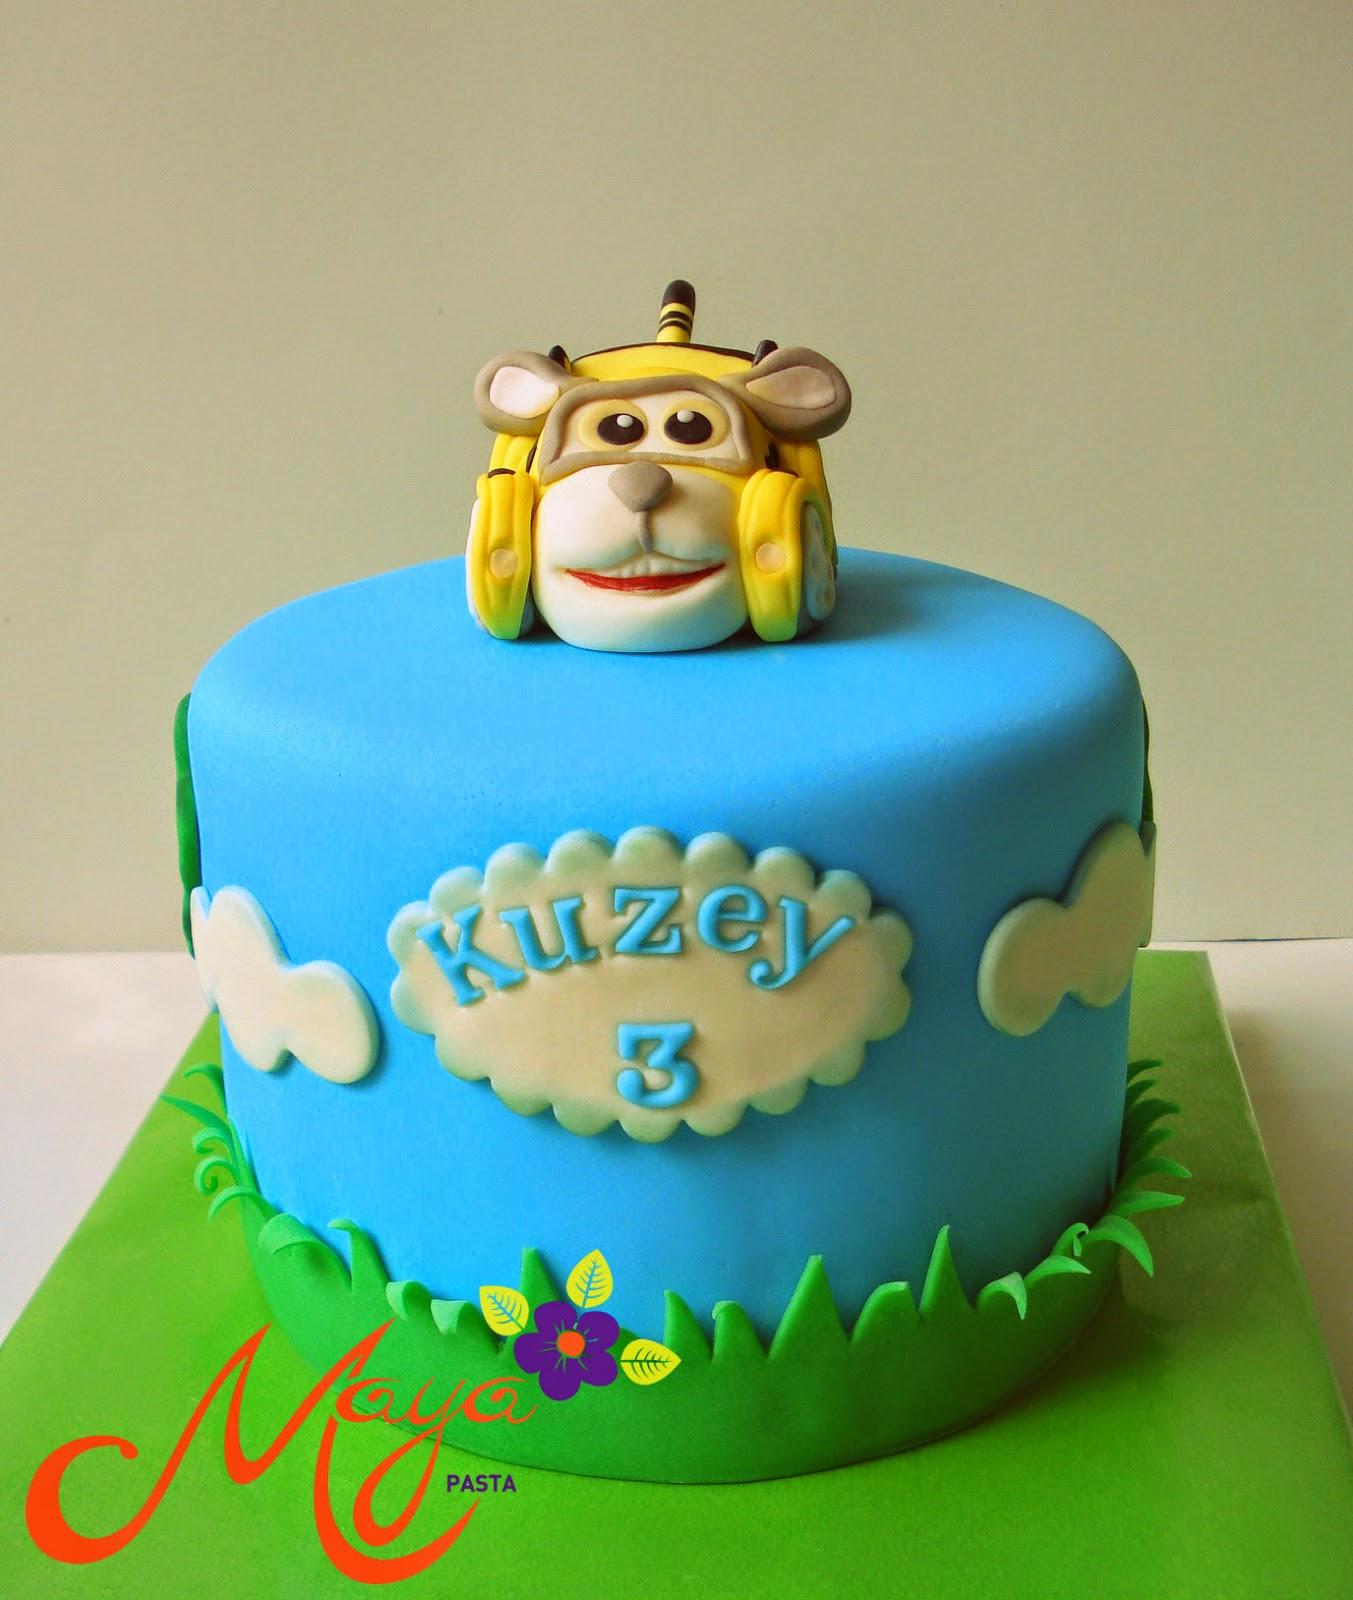 Vroomiz cake